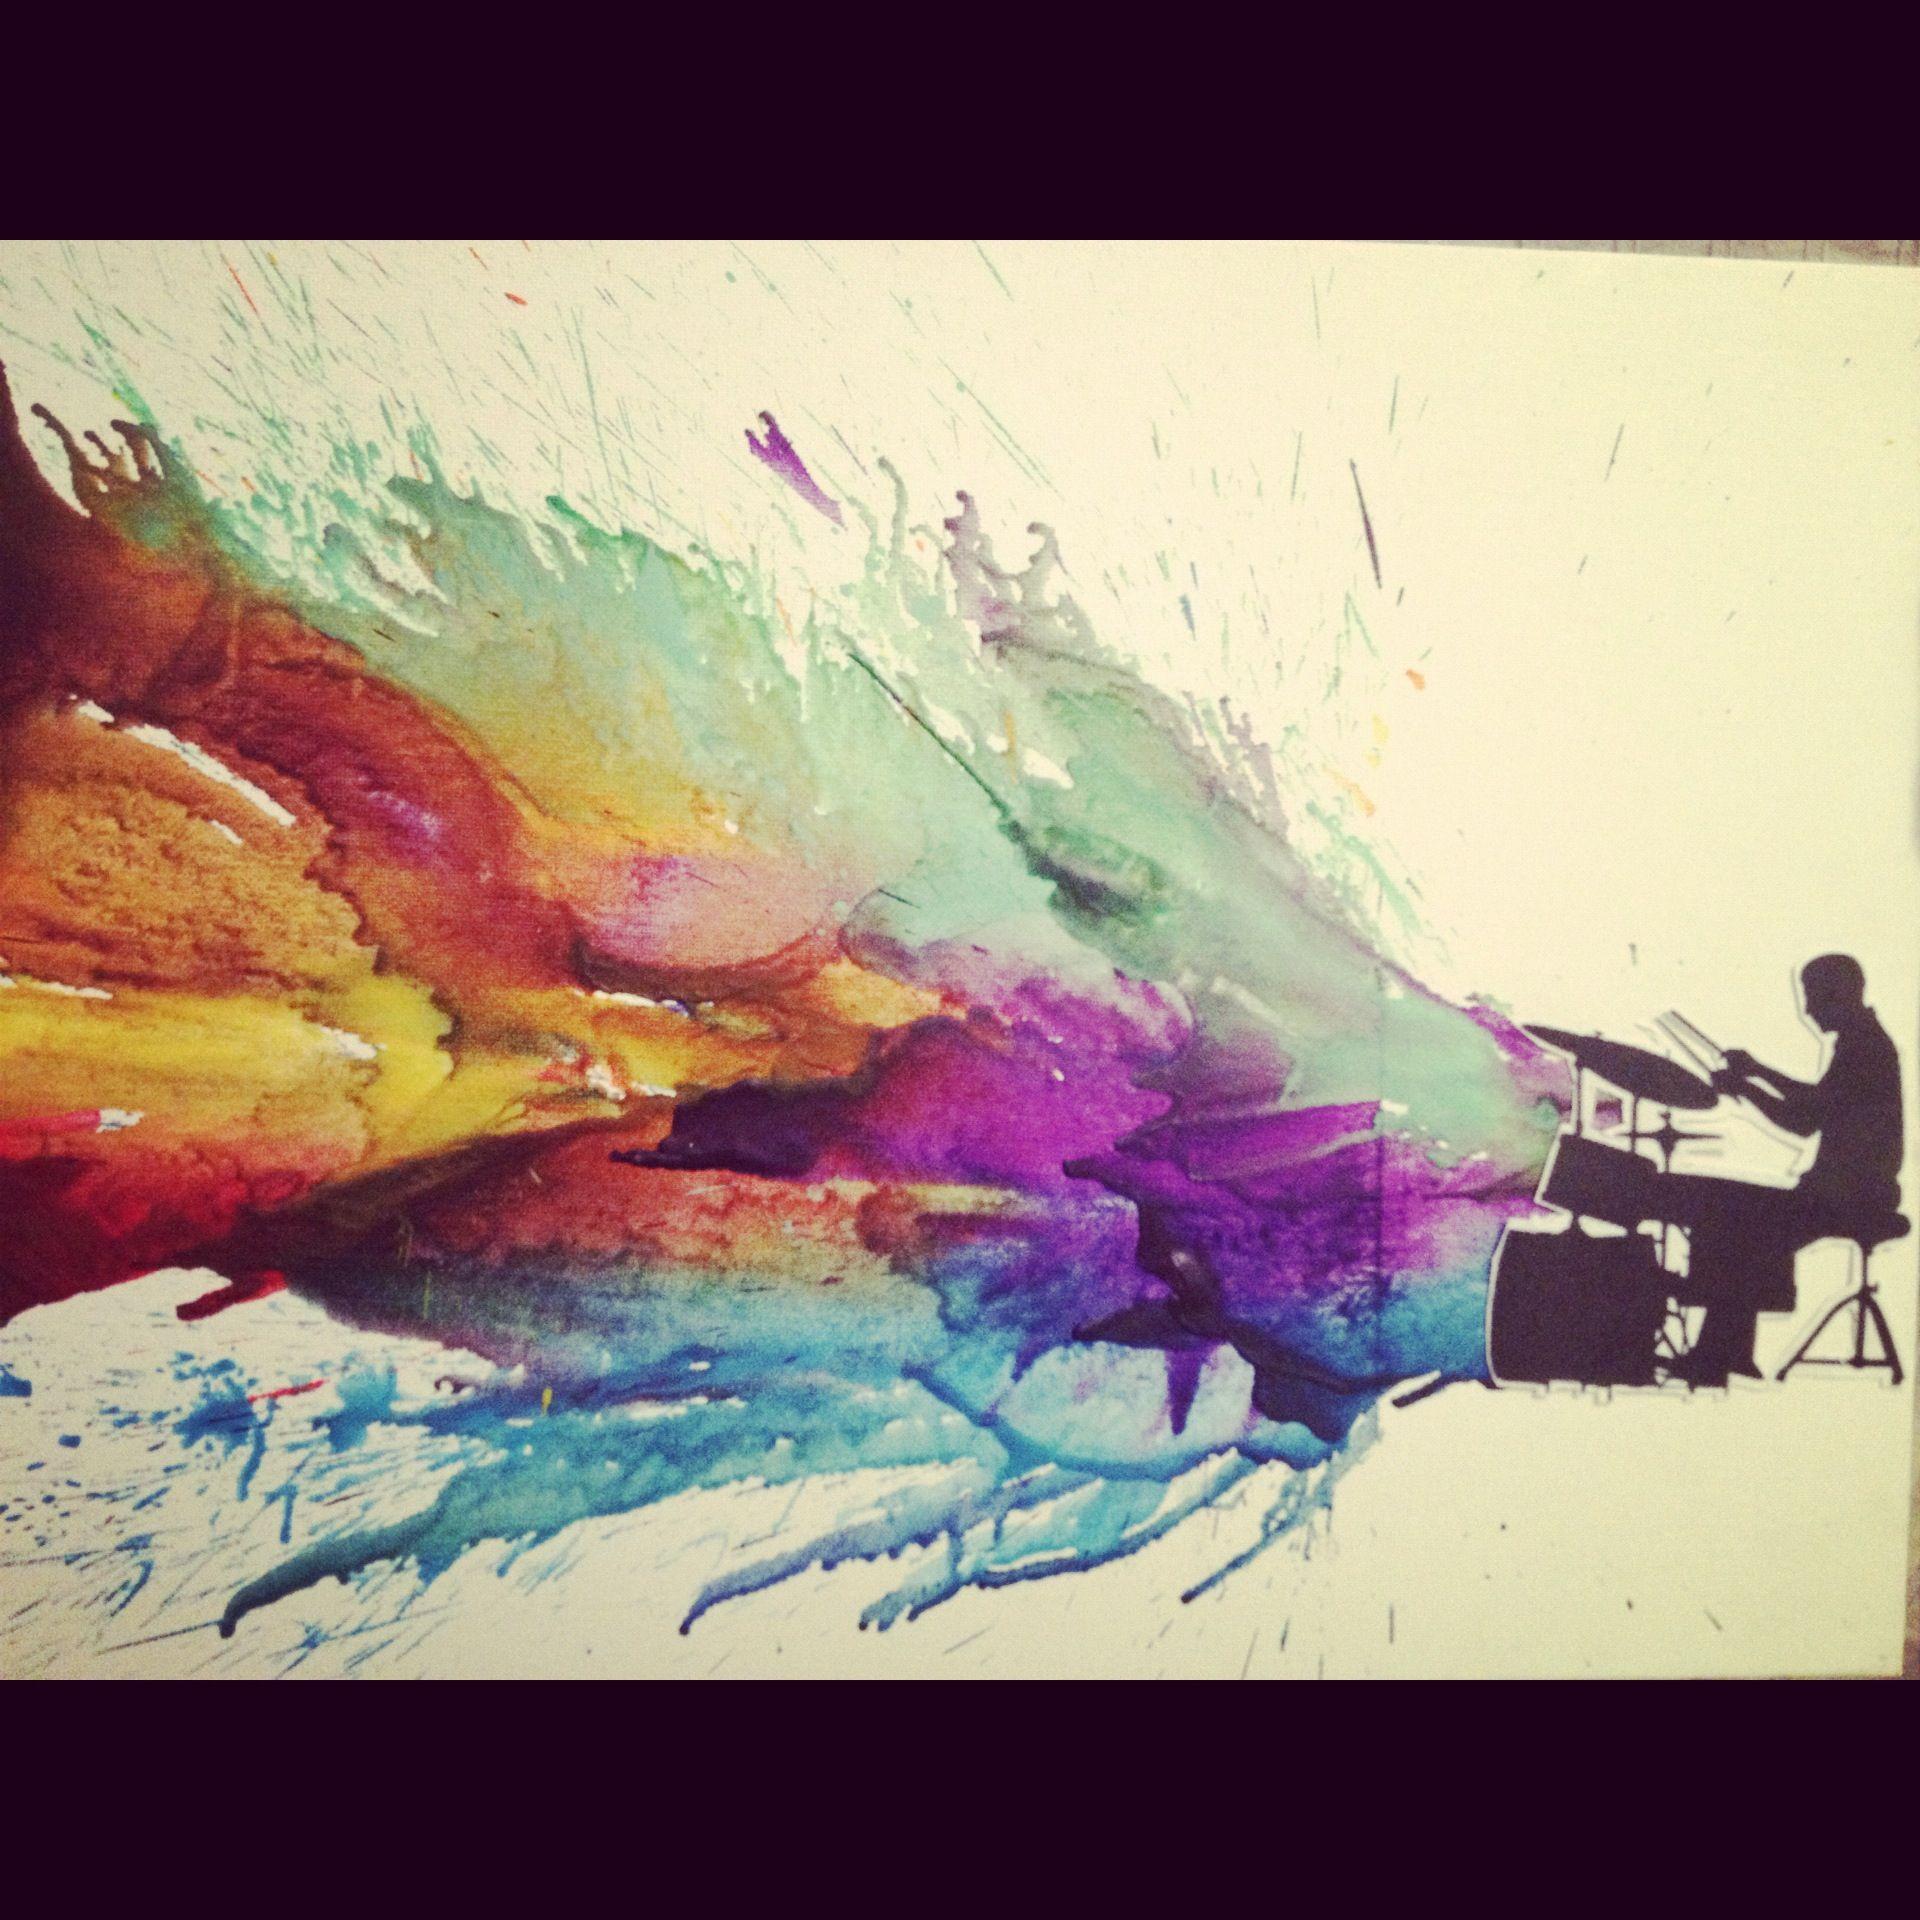 Caran D Ache Neocolor Ii Aquarelle Watersoluble Crayons In 2020